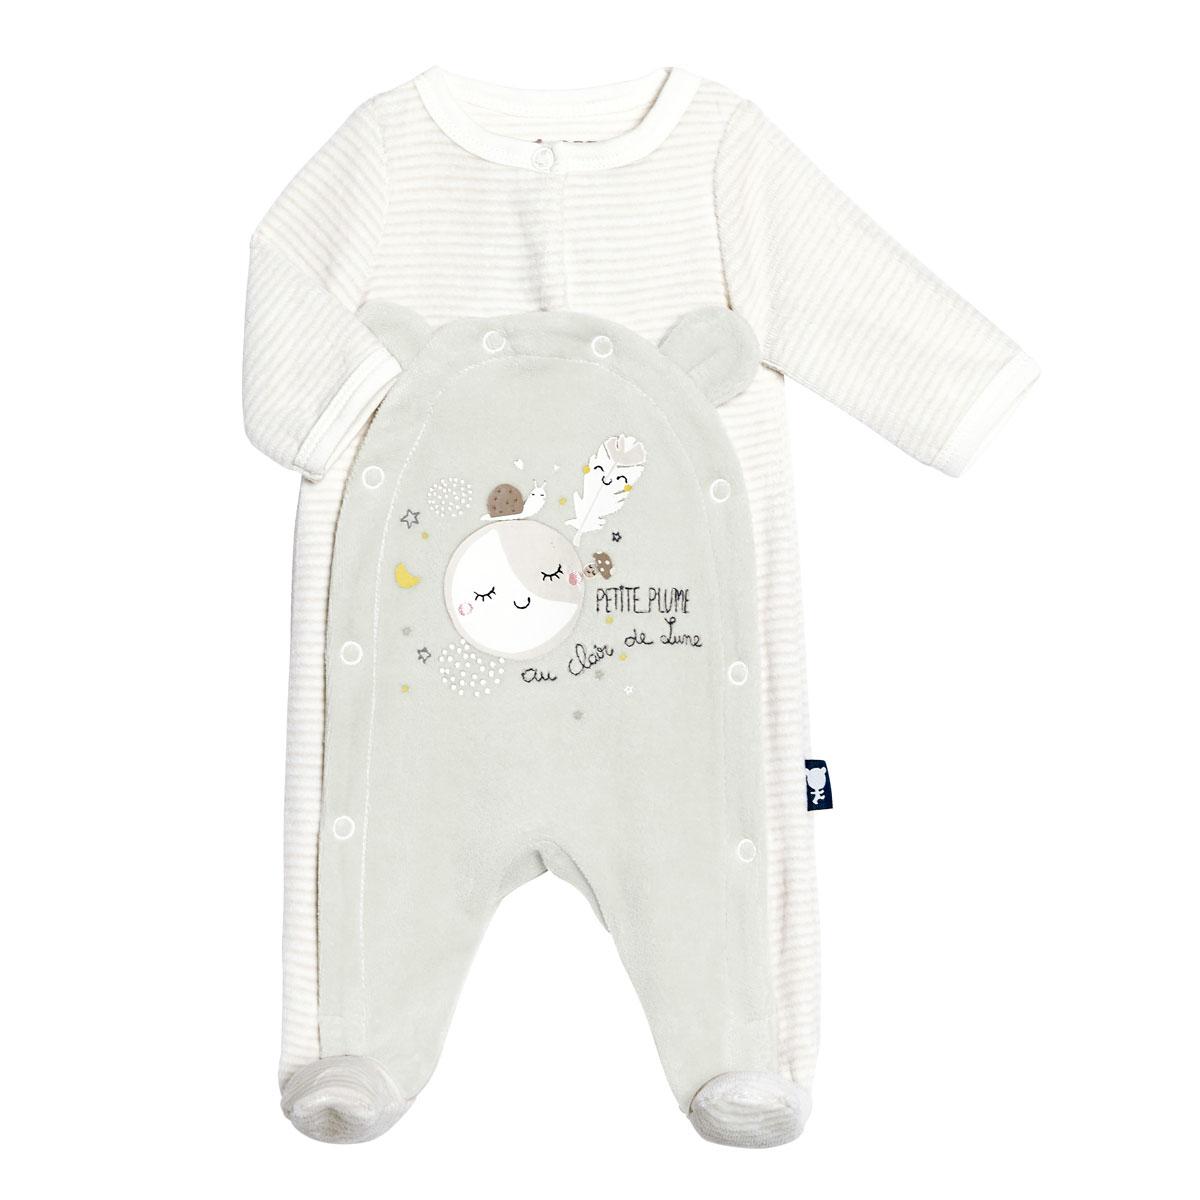 Pyjama bébé velours mixte Petite Plume